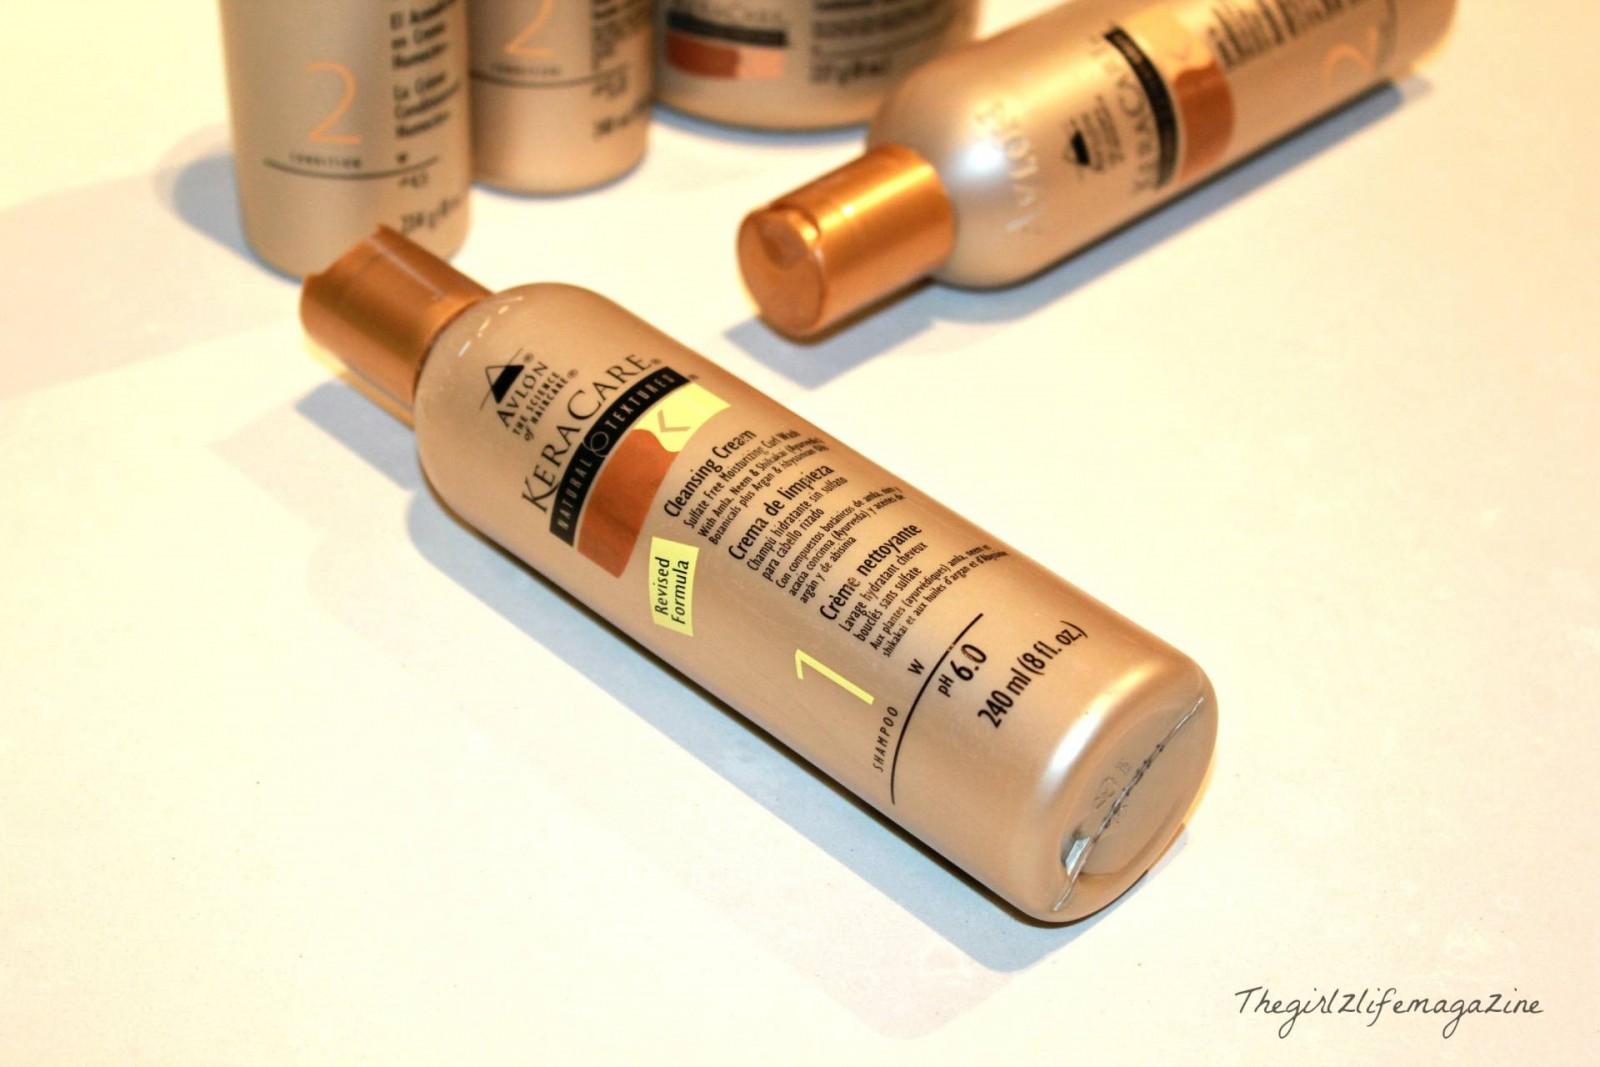 Keracare Natural Textures et sa Cleansing cream: mon indispensable capillaire du moment